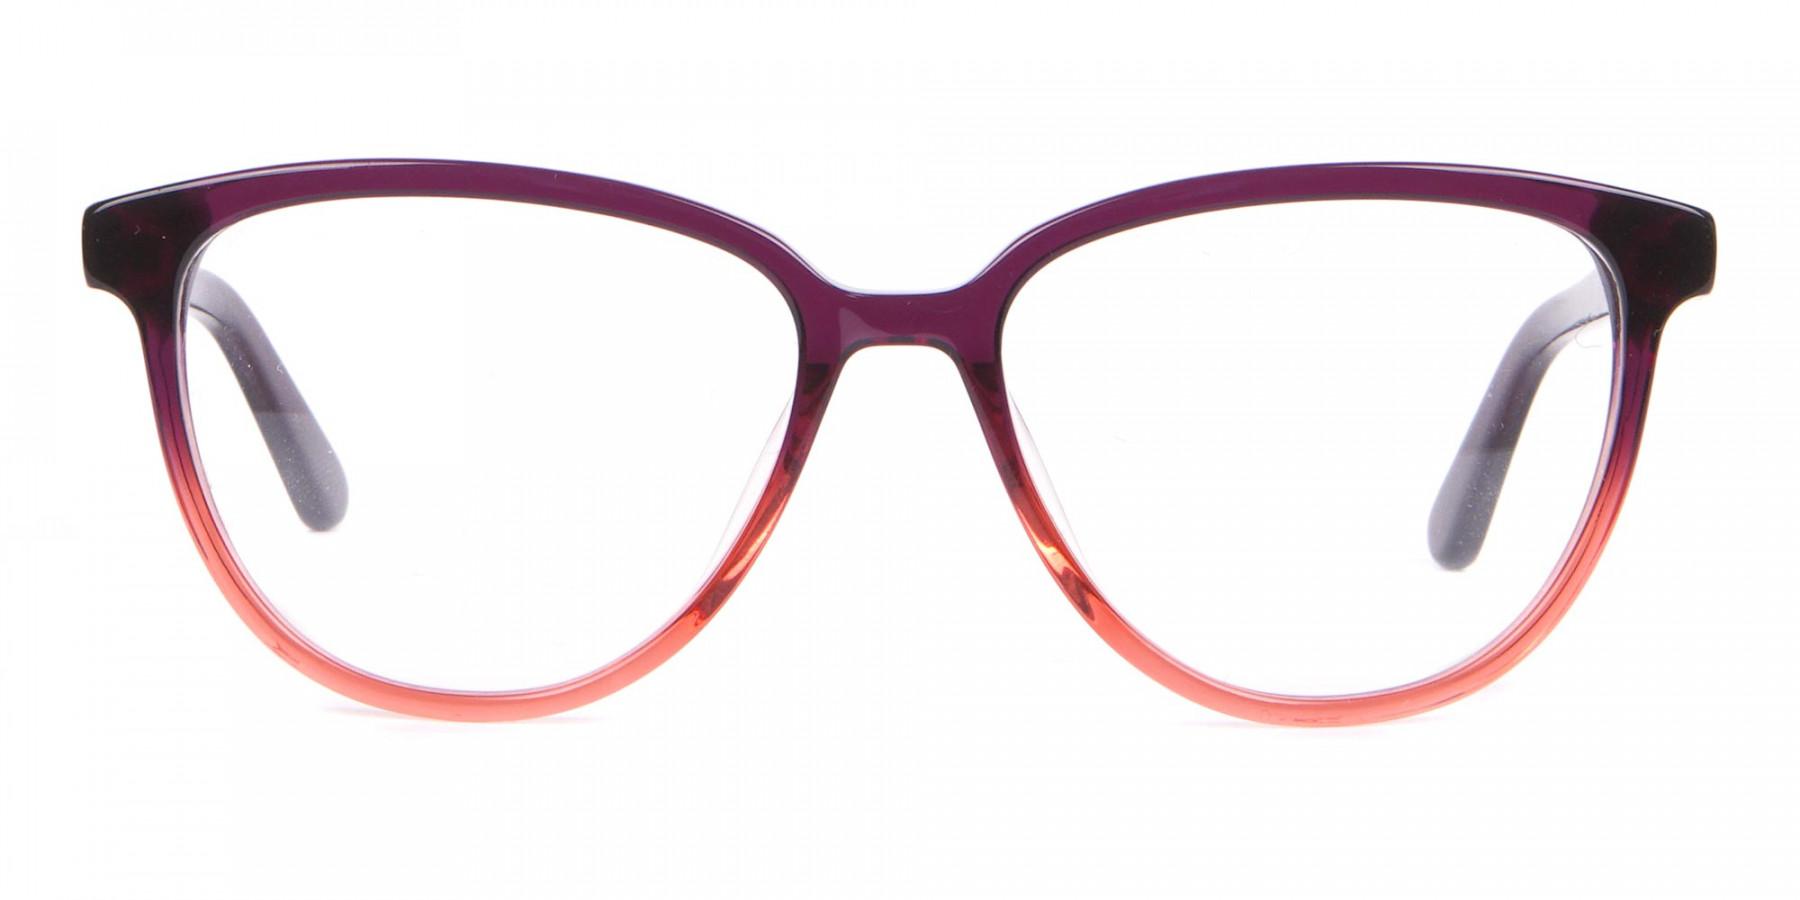 Calvin Klein CK18514 Women Cateye Glasses In Plum Coral-1